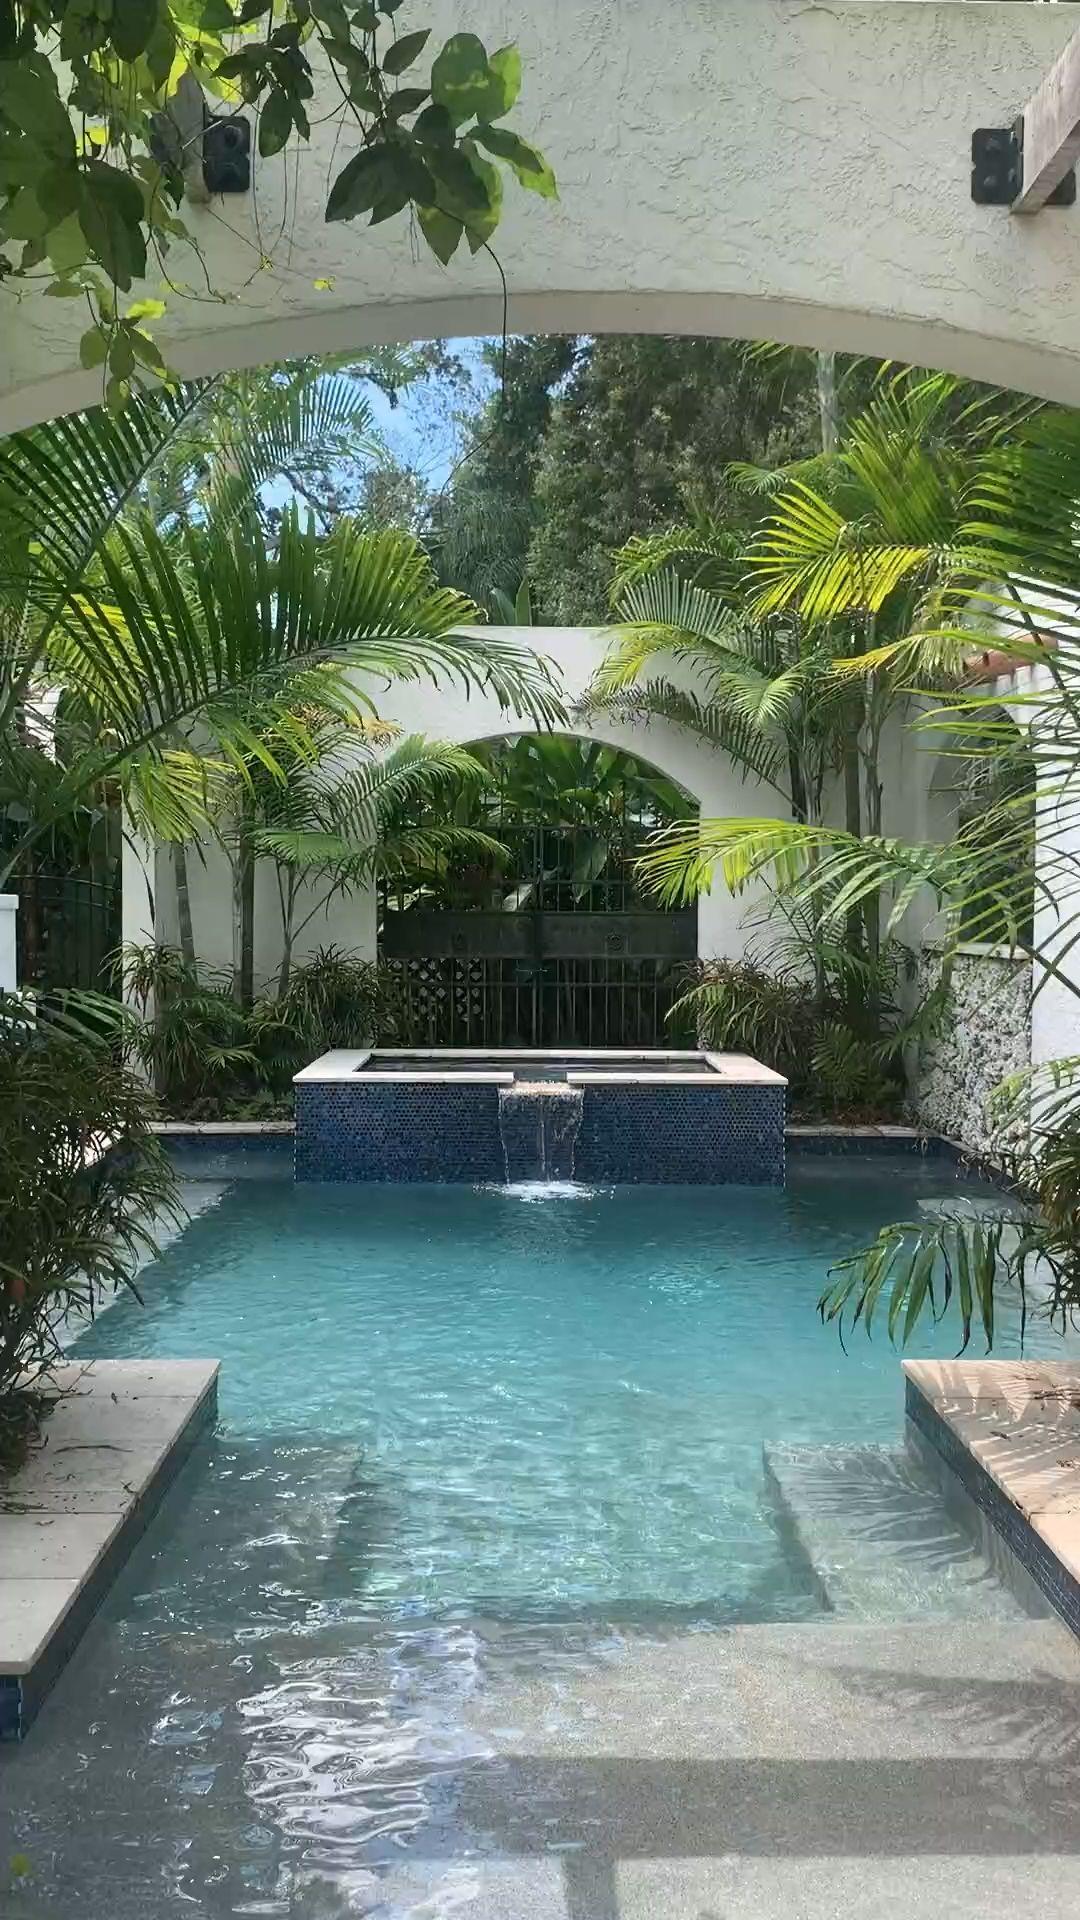 20 Excellent City Garden Design Ideas That Bring Green Paradise For You Swimming Pools Backyard Backyard Pool Courtyard Gardens Design